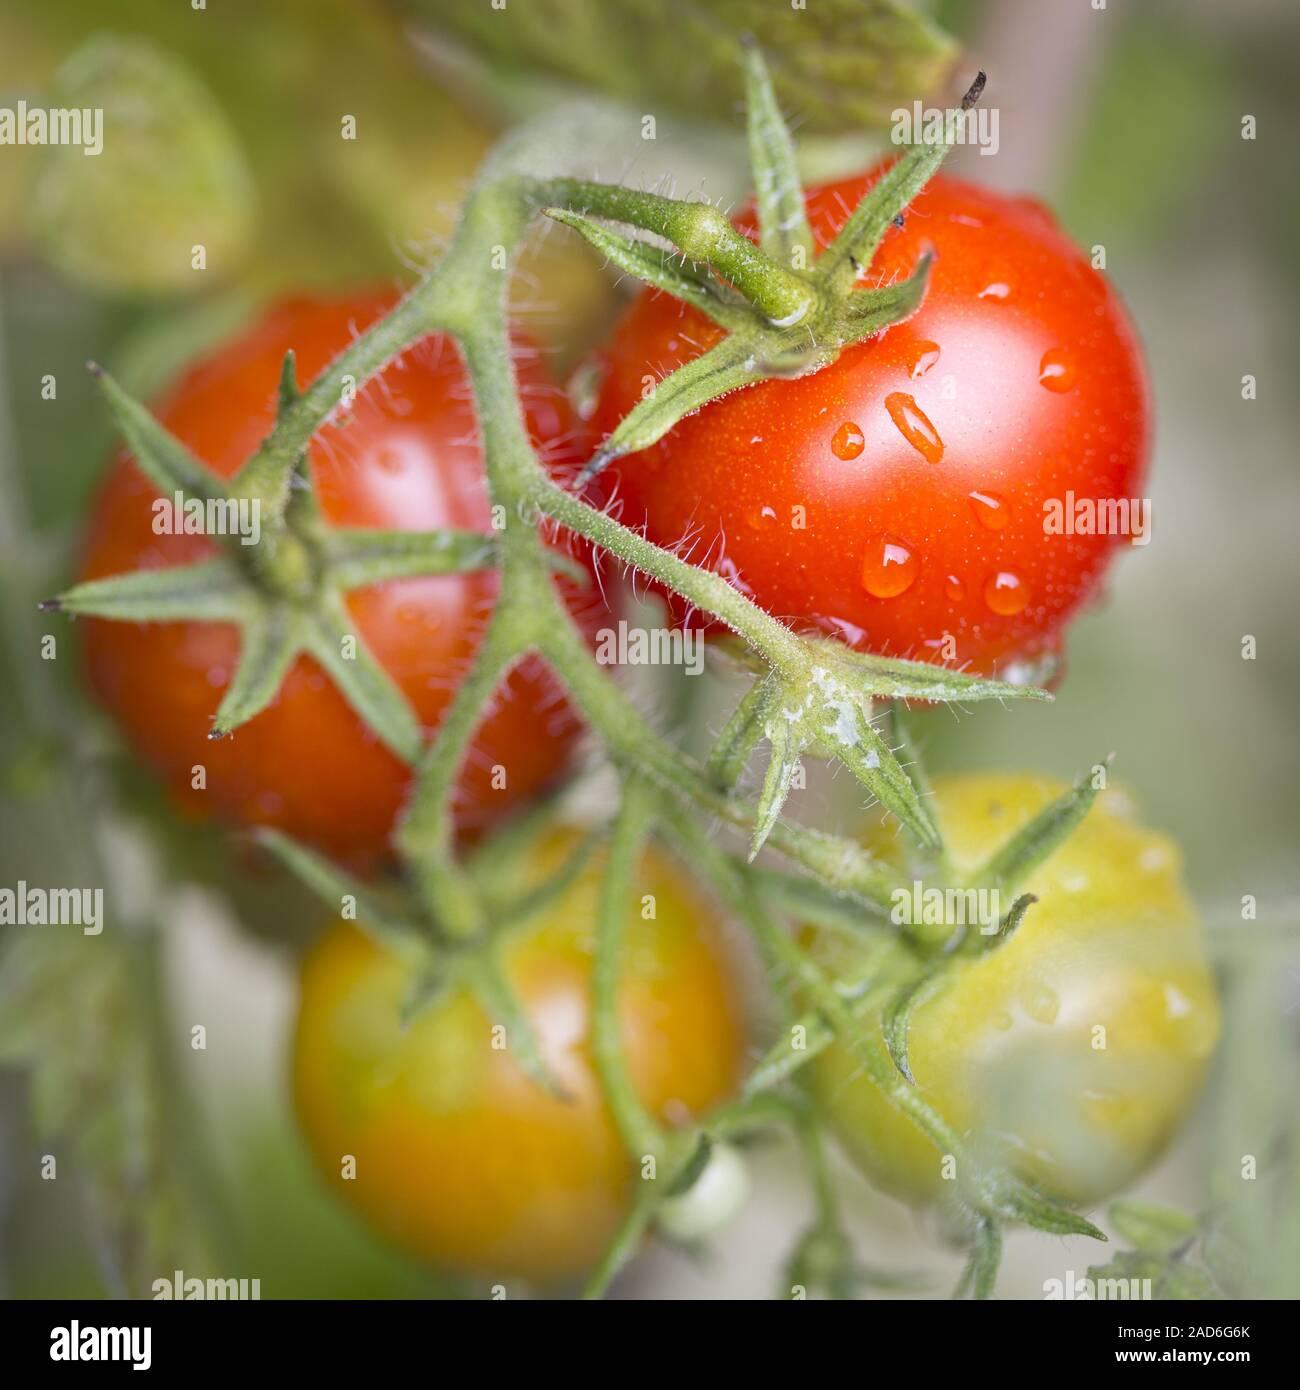 Tomates Cherry de arbusto, close-up, formato cuadrado Foto de stock